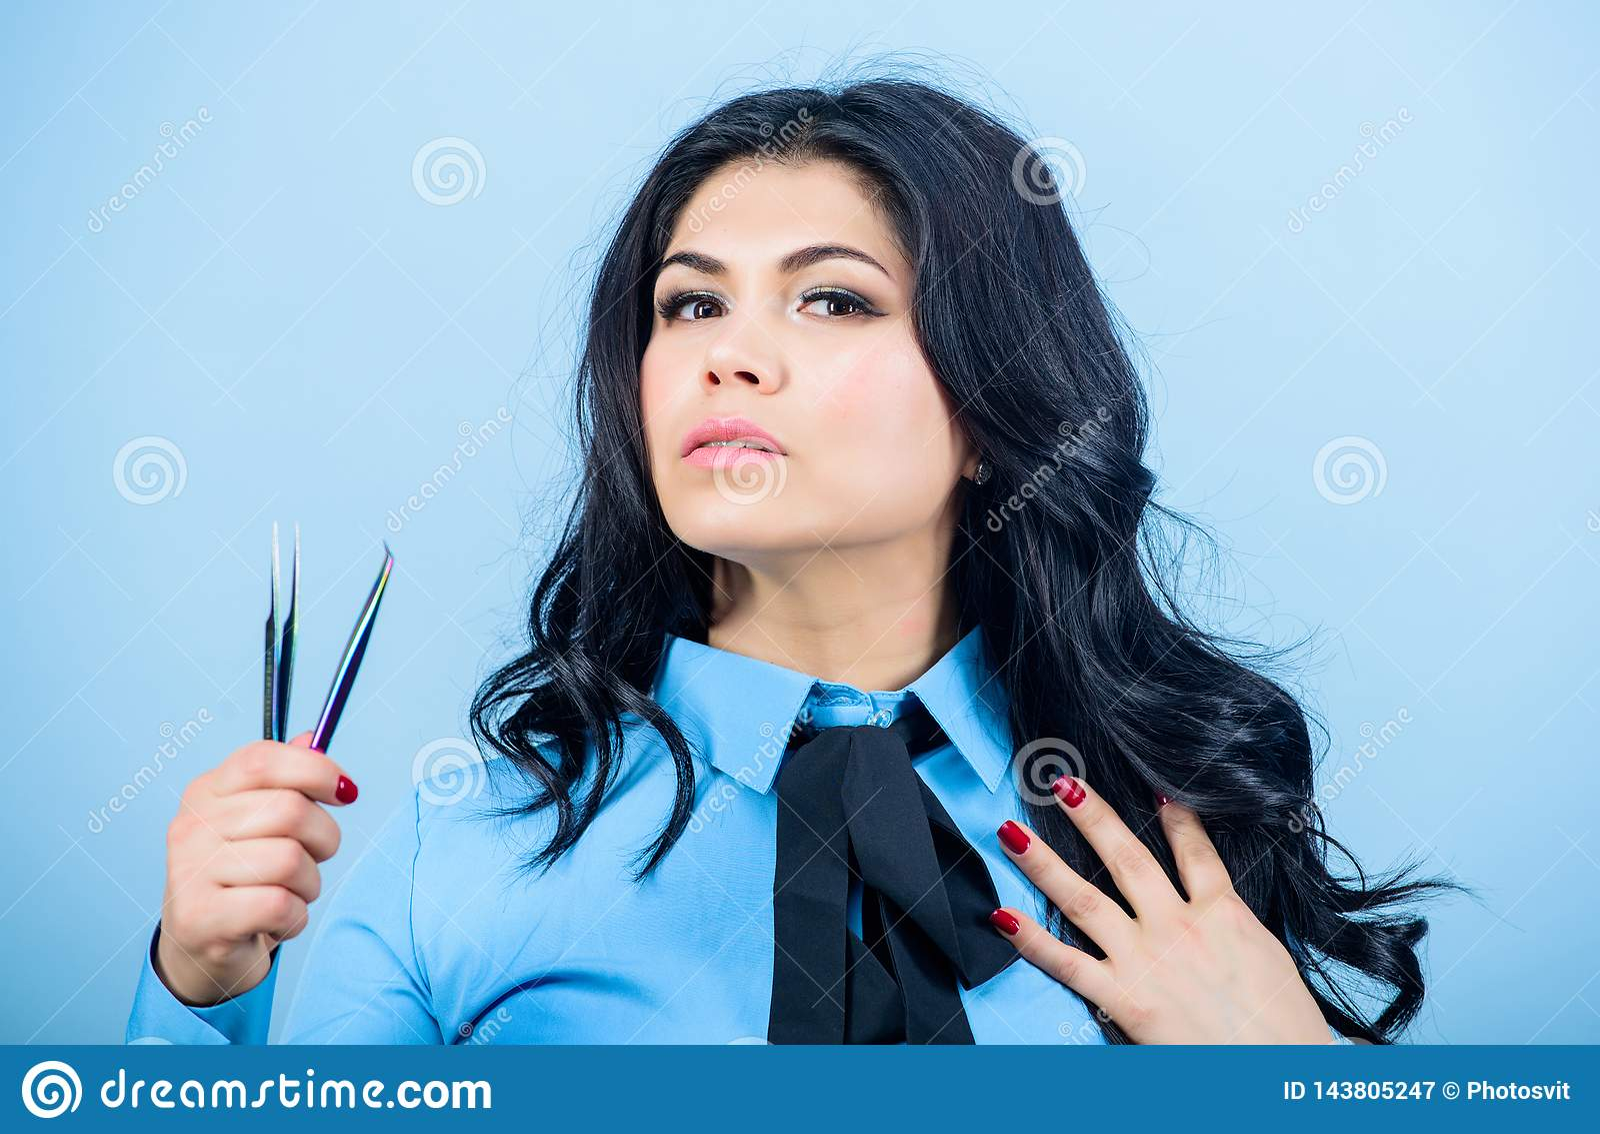 Professional makeup artist. Cosmetic tweezer tool. Beauty shop concept. Makeup false lashes volume. Lash applicator